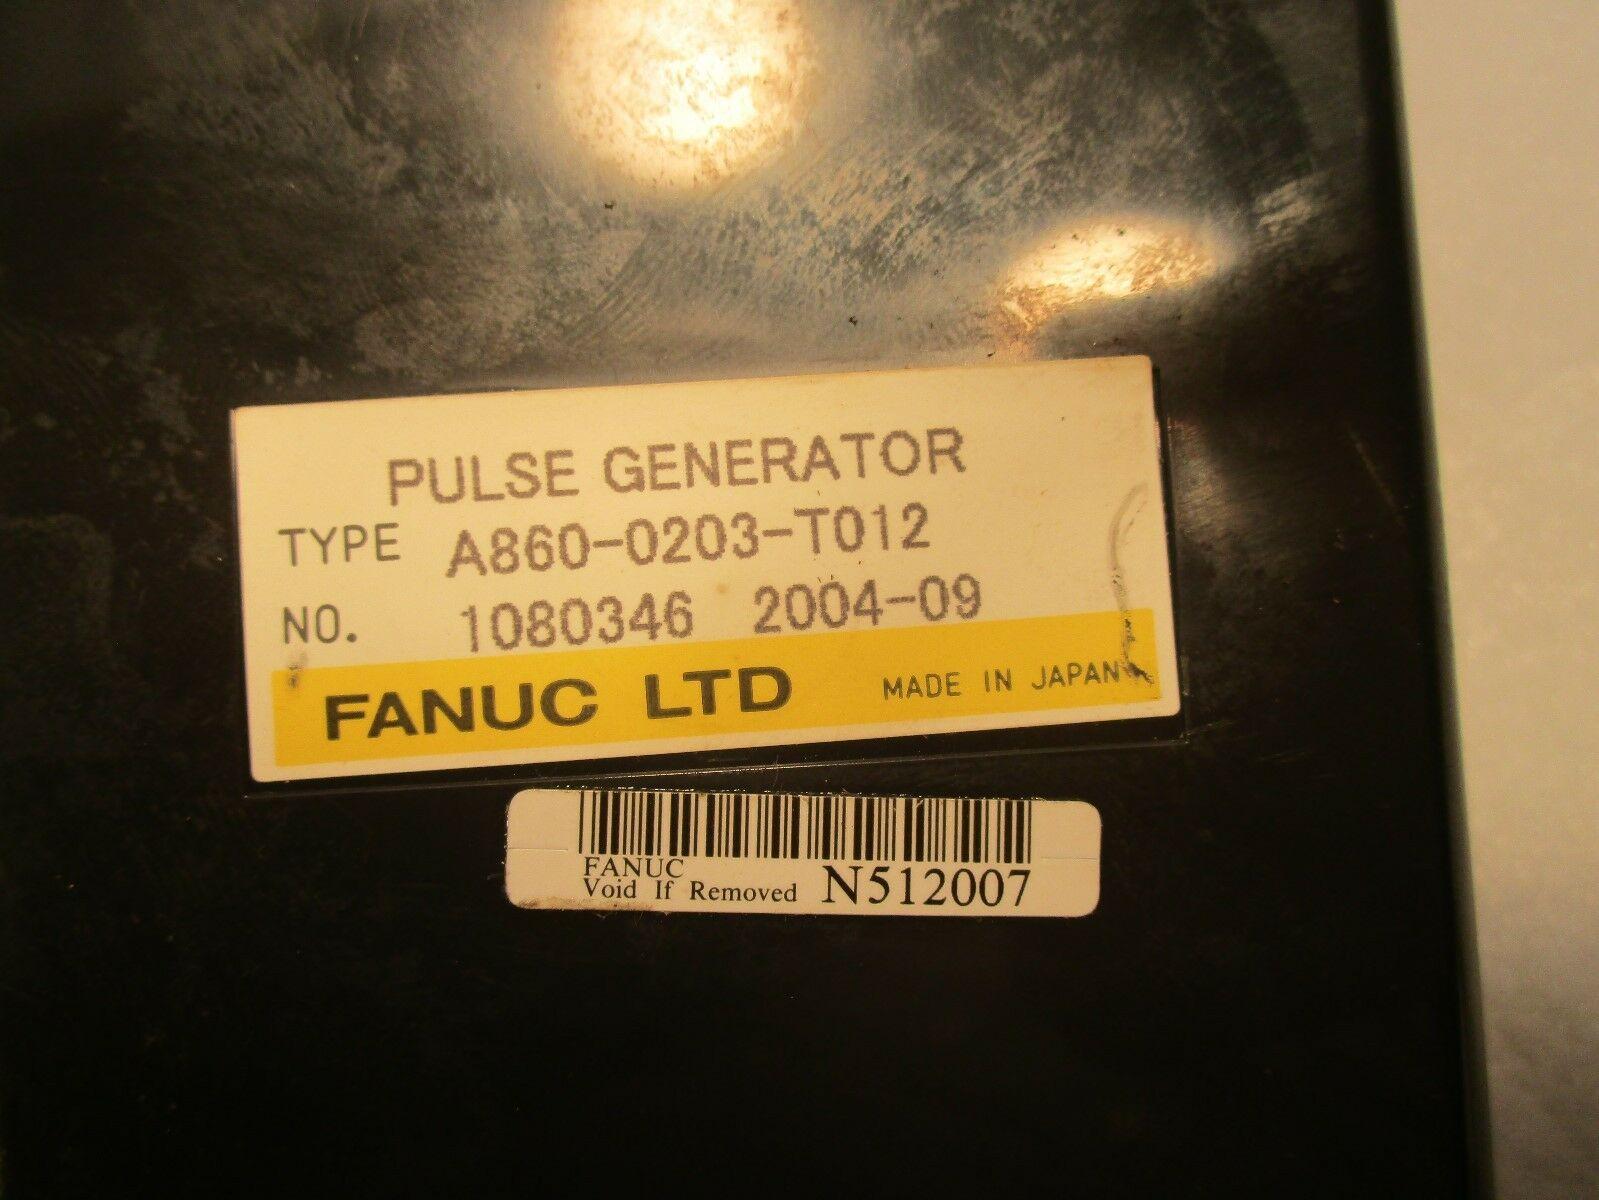 Fanuc Manual Pulse Generator Handy Pendent 3-Axis A860-0203-T012